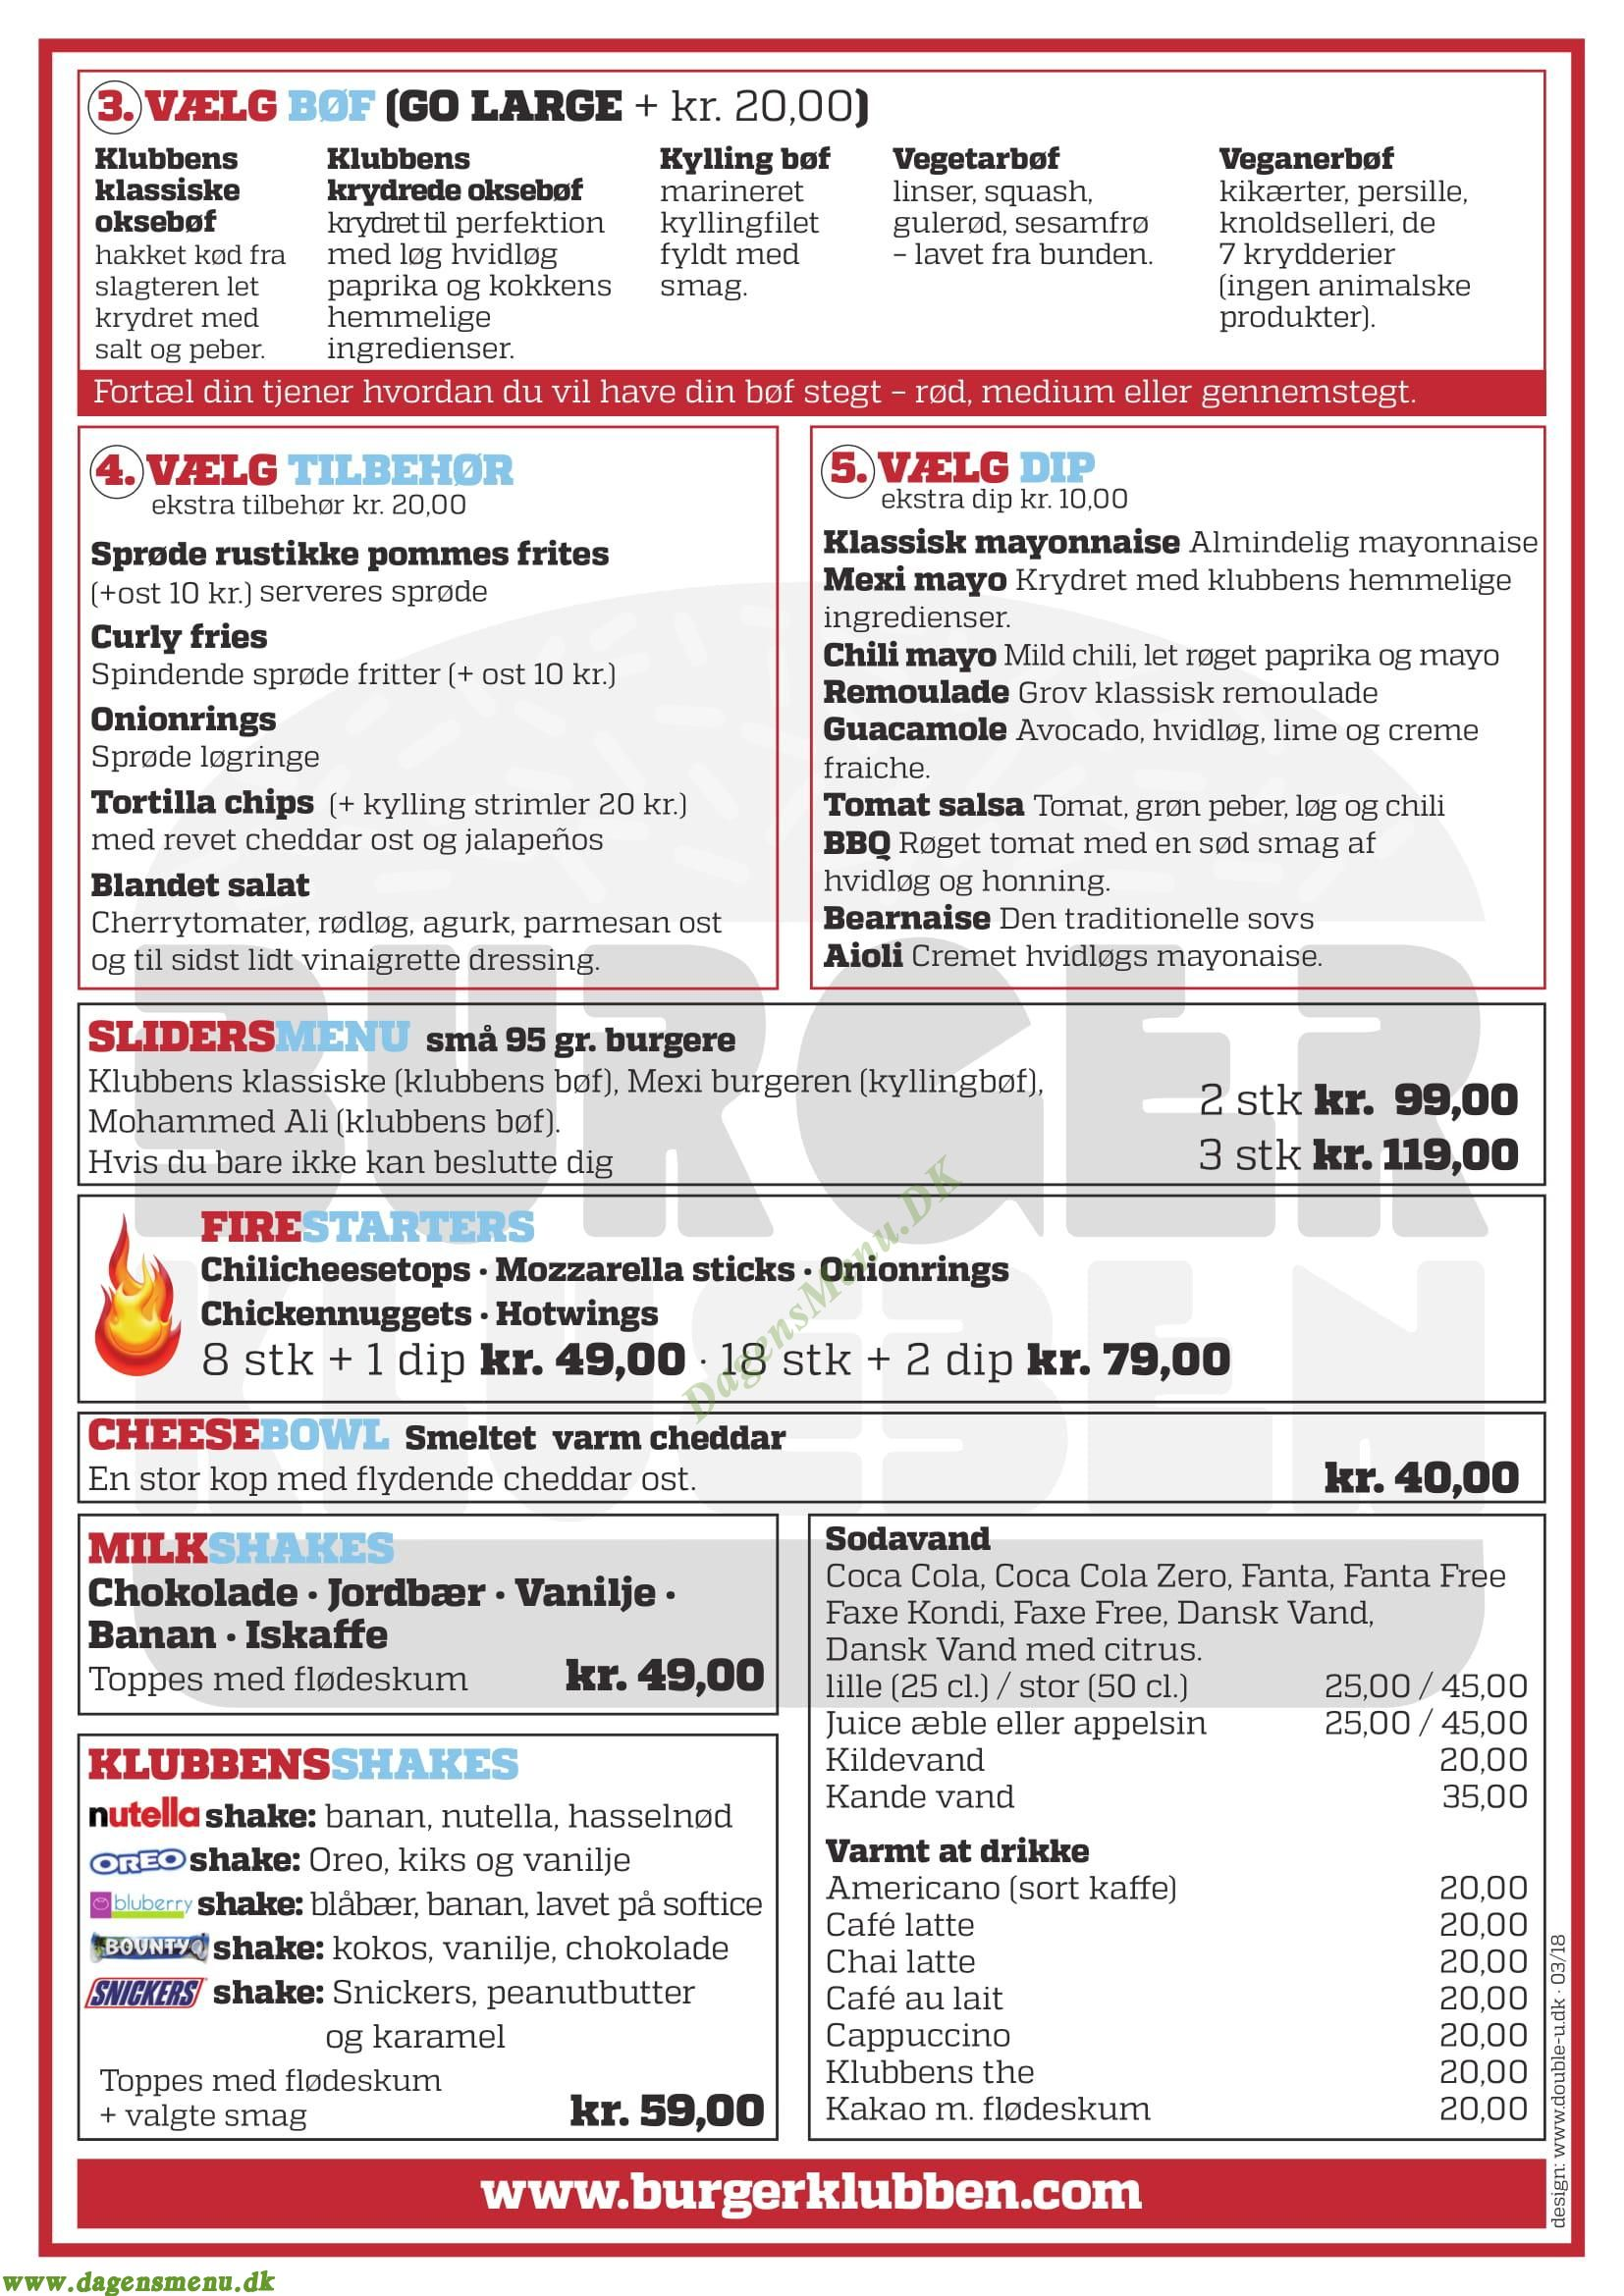 Burgerklubben - Menukort